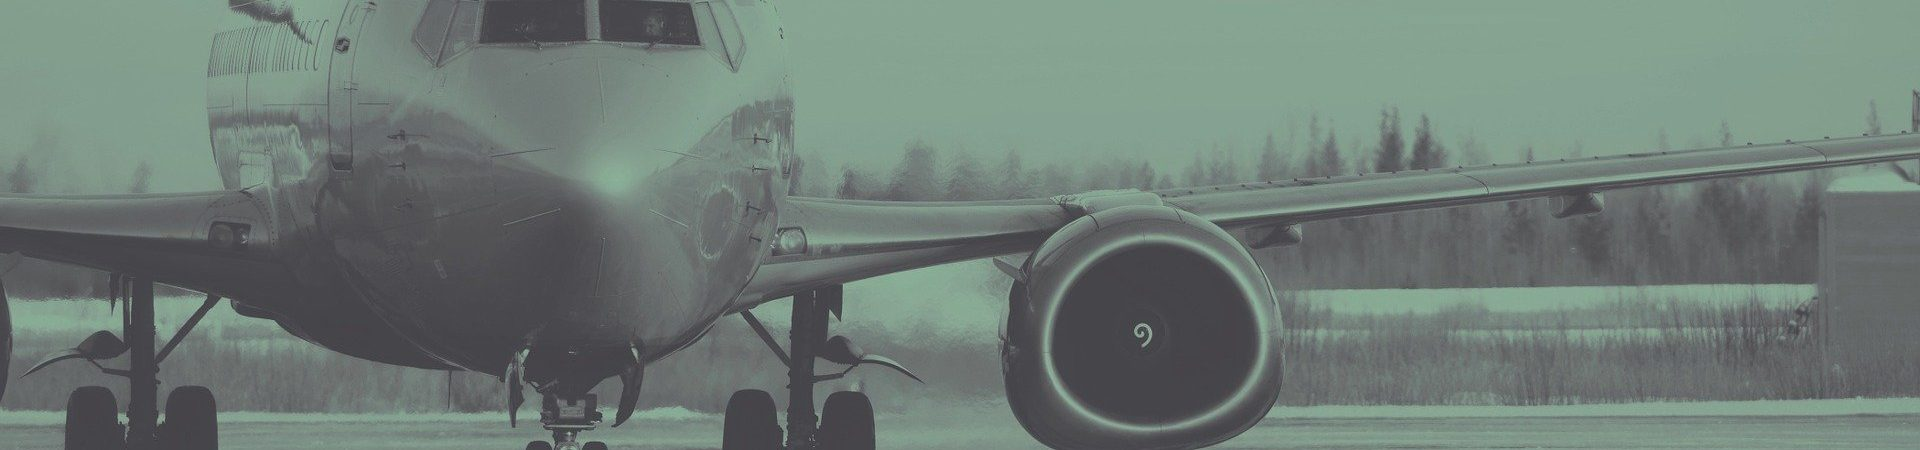 fly til lissabon